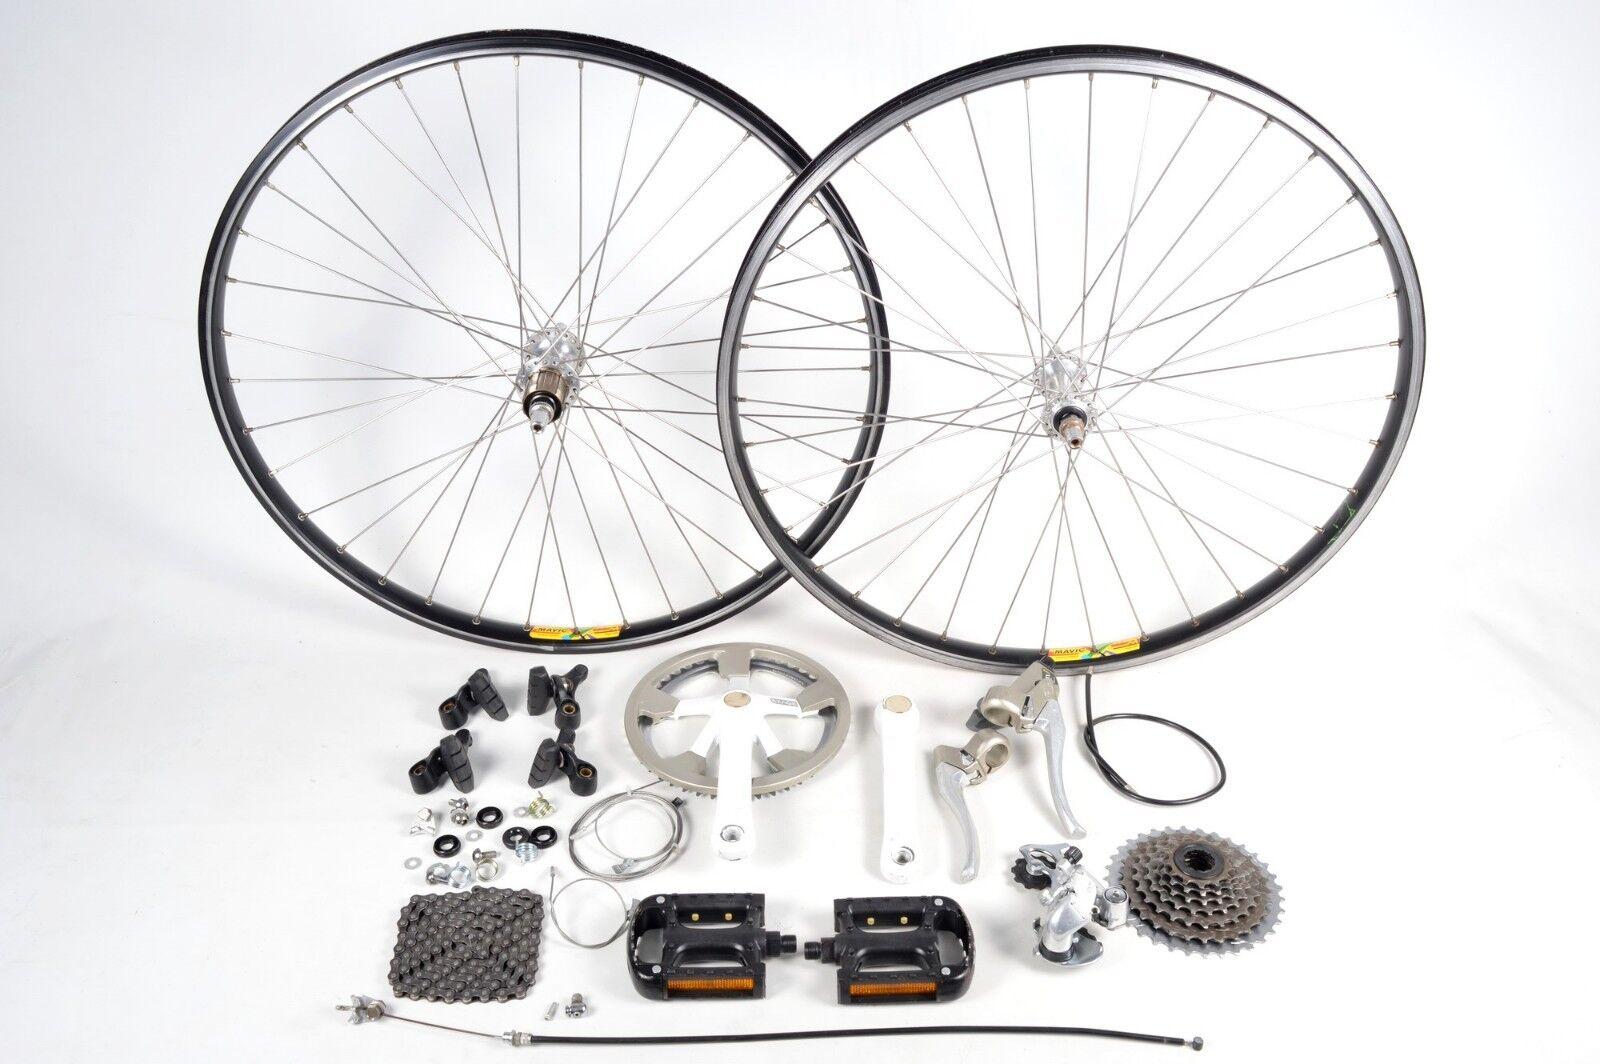 Shimano Exage Bicycle Groupset 7 Speed Crankset Brakes Pedals Mavic 26  Wheelset